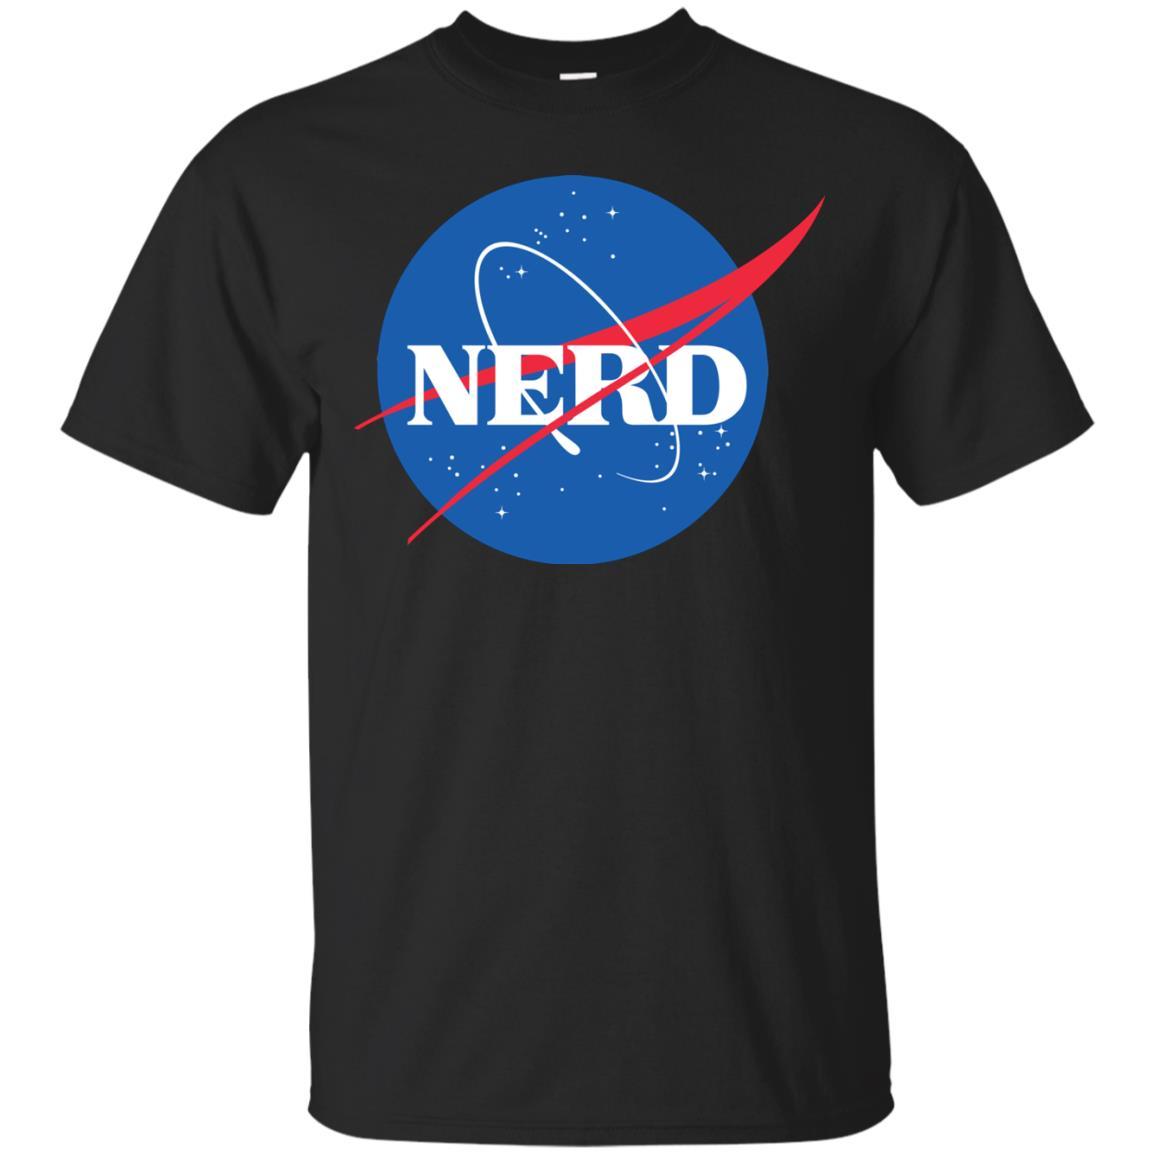 nerd nasa logo t shirts. Black Bedroom Furniture Sets. Home Design Ideas